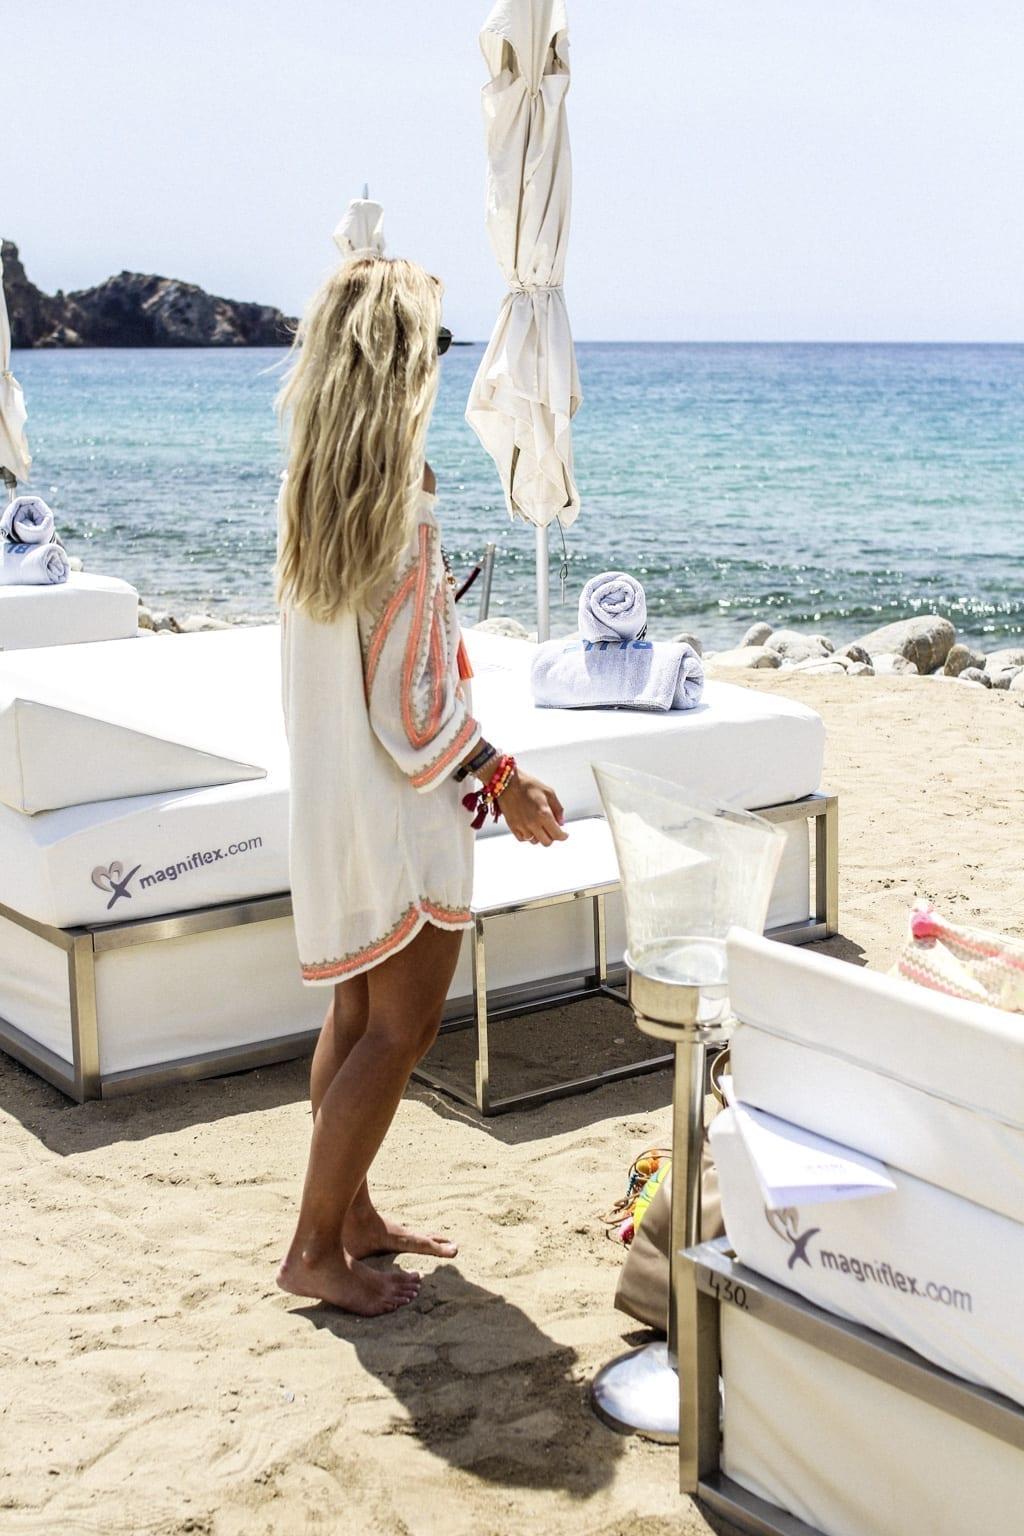 CK1605_Constantly-Blue-Marlin-Beach-Club-Ibiza-Spain-8175